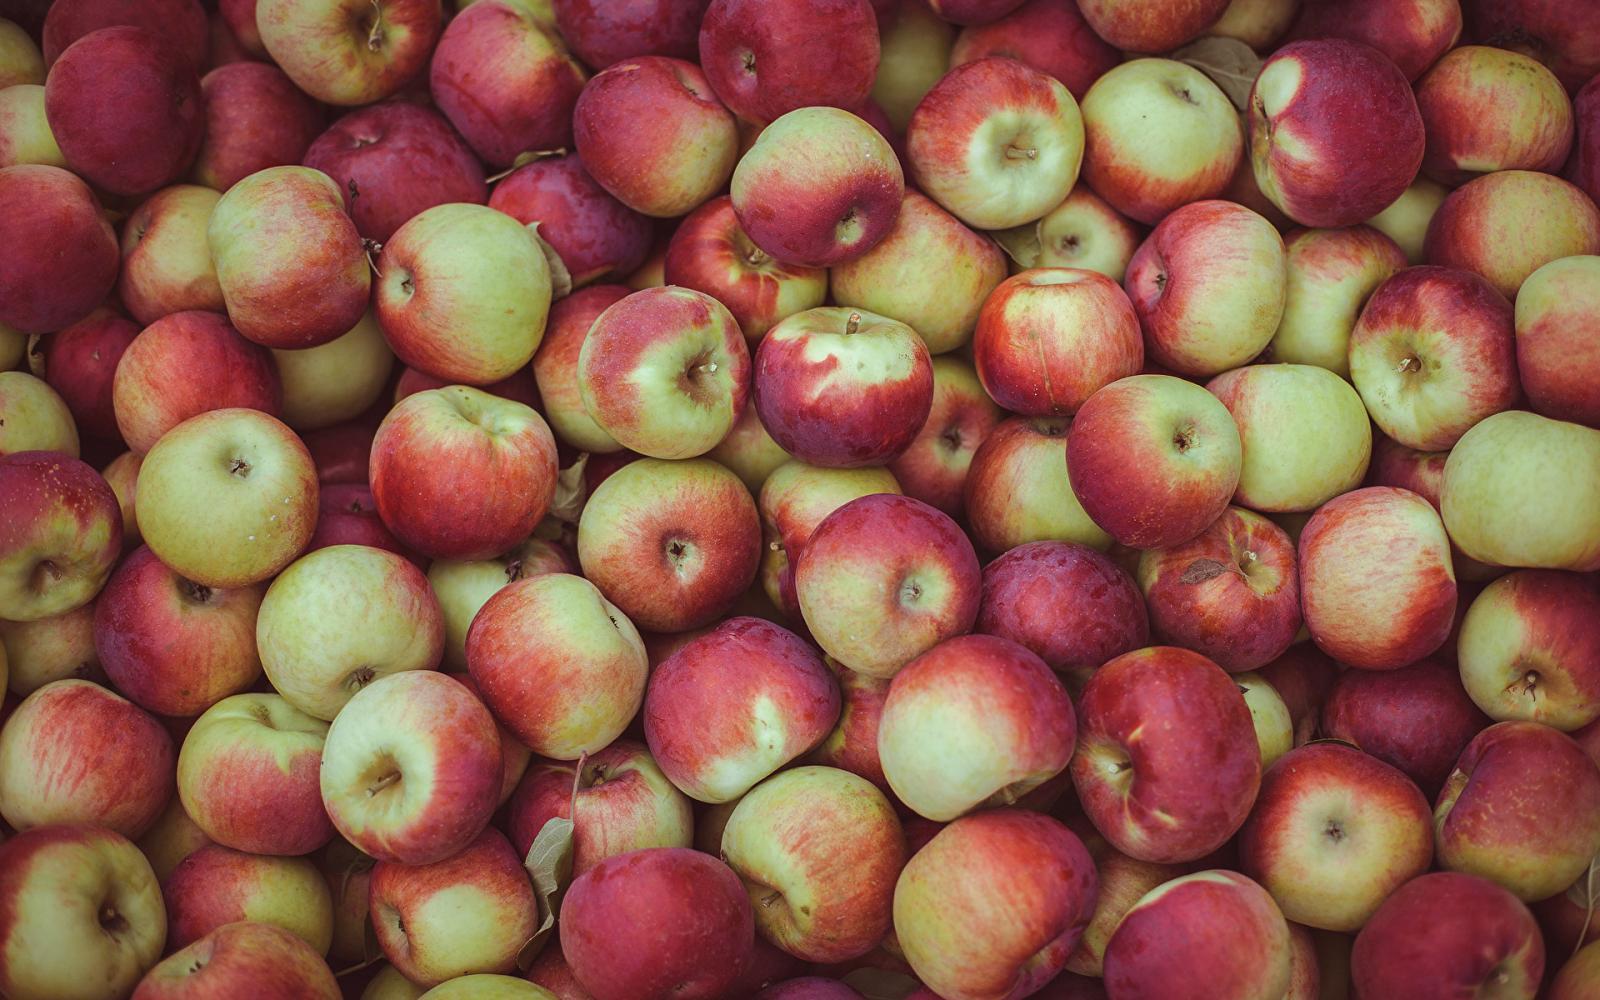 Накануне в области уничтожили более 4,5 тонн яблок